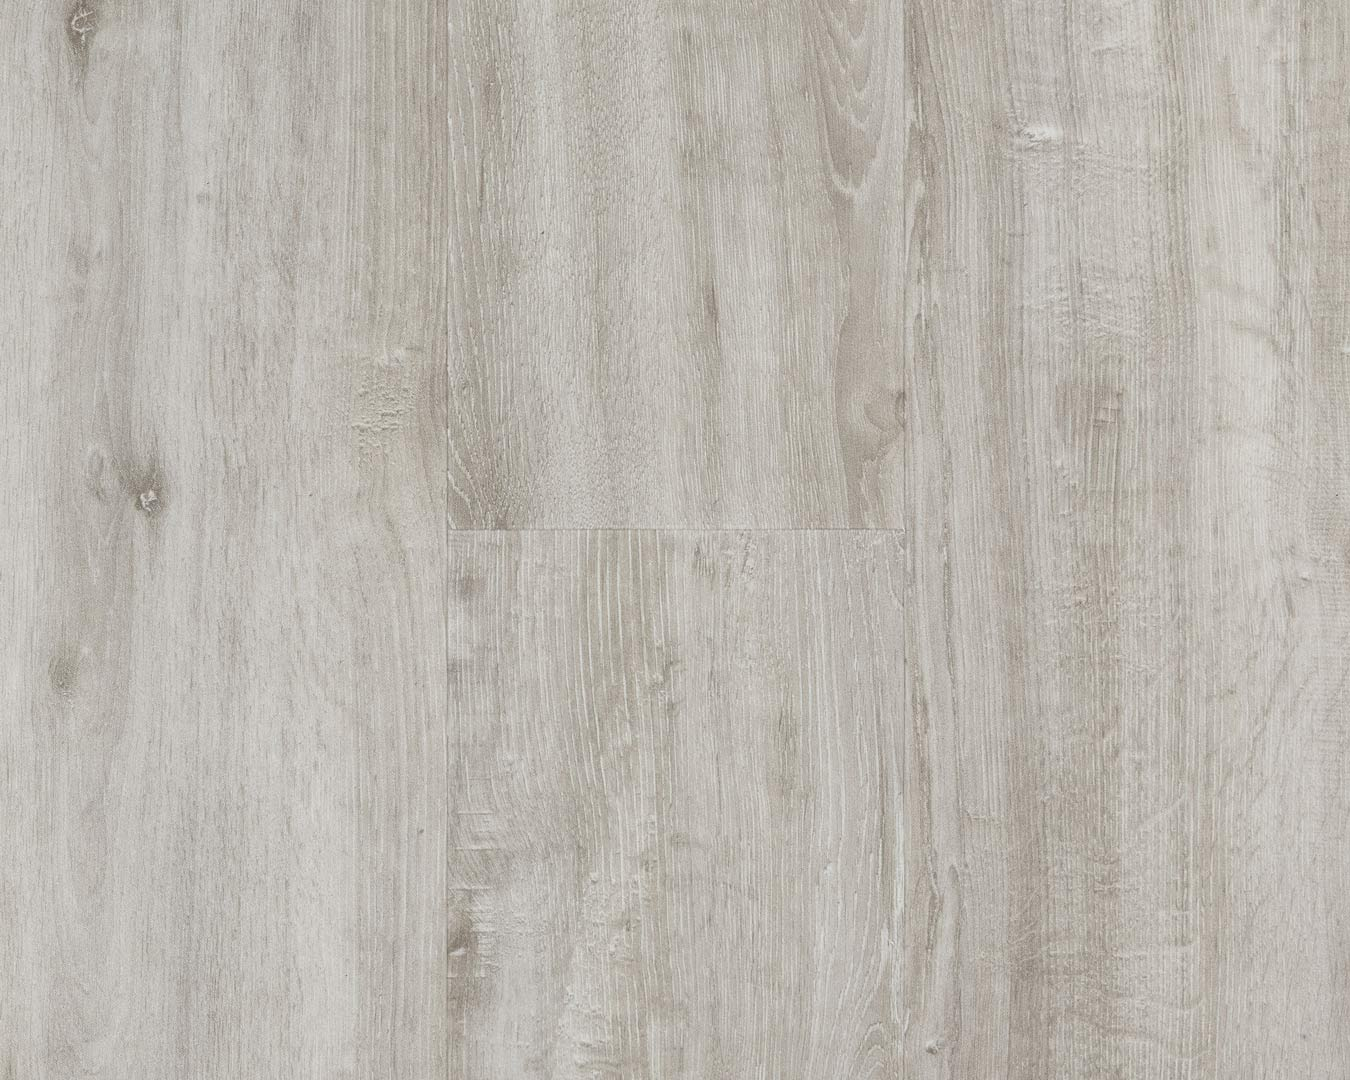 Rigid-Vinylboden - Lime Oak - Ansicht 1